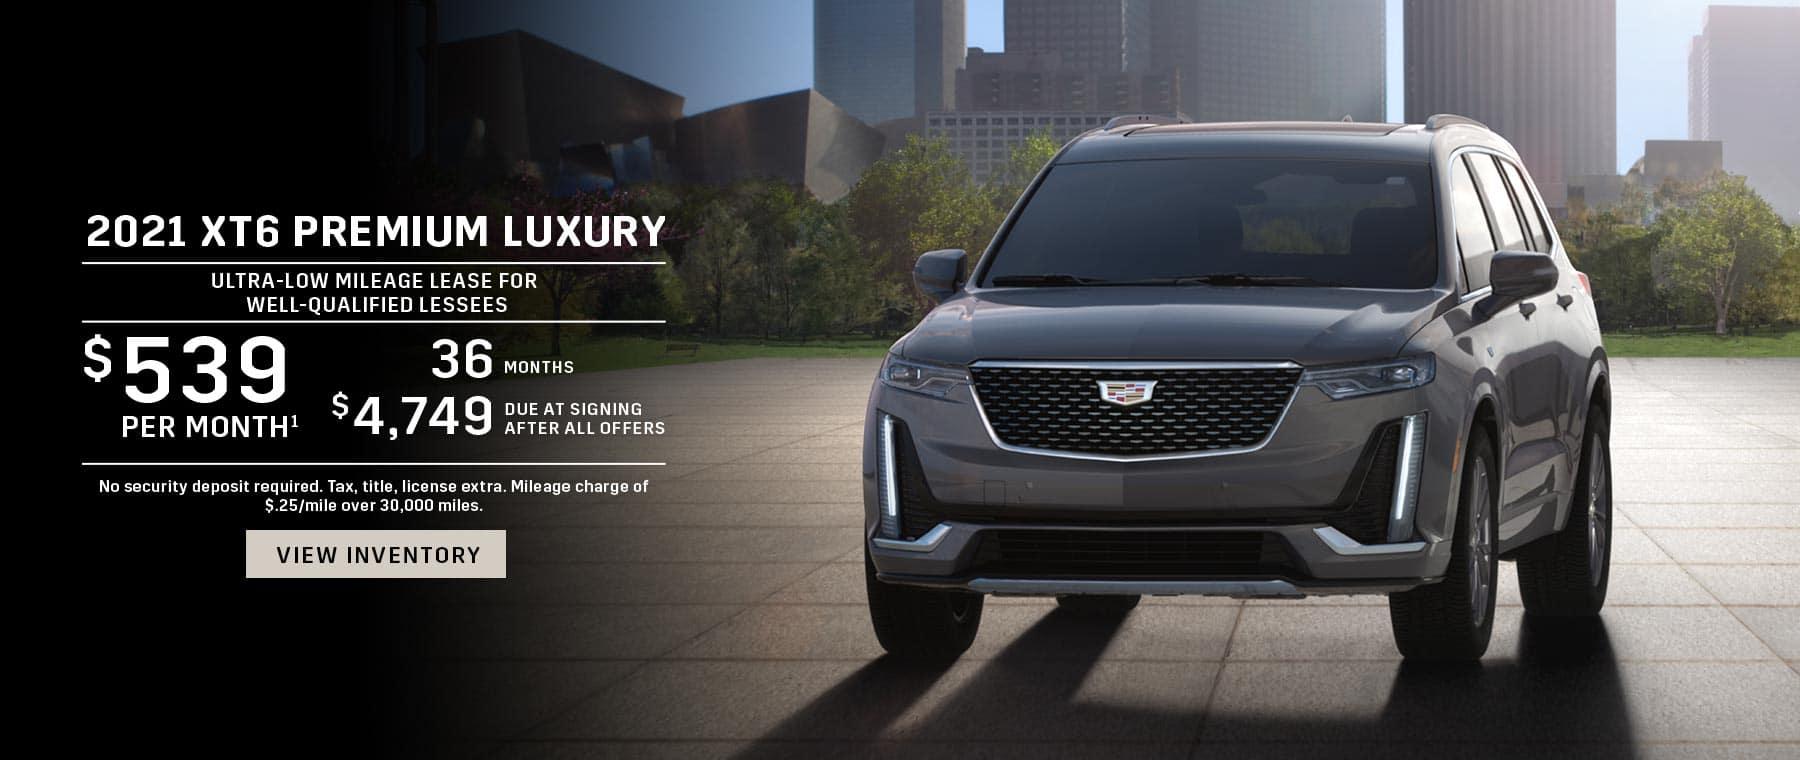 2021 Cadillac XT6 Lease offer